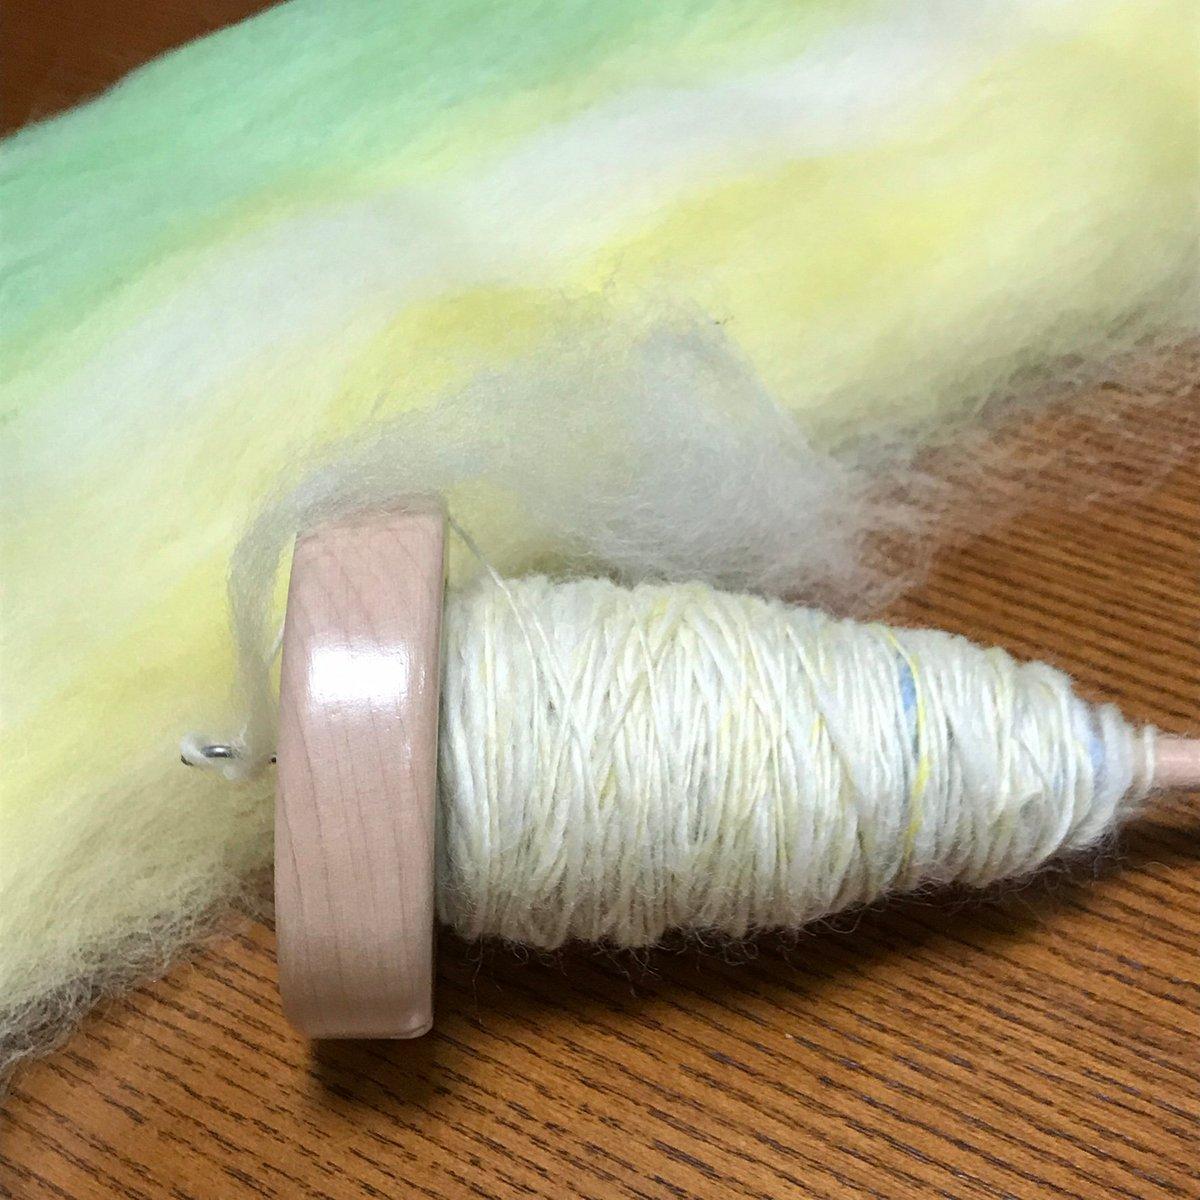 test ツイッターメディア - 本日は、スピンドルで糸紡ぎです  #手紡ぎ #毛糸 #スピンドル #手編み糸 https://t.co/9q7QGe4IN9